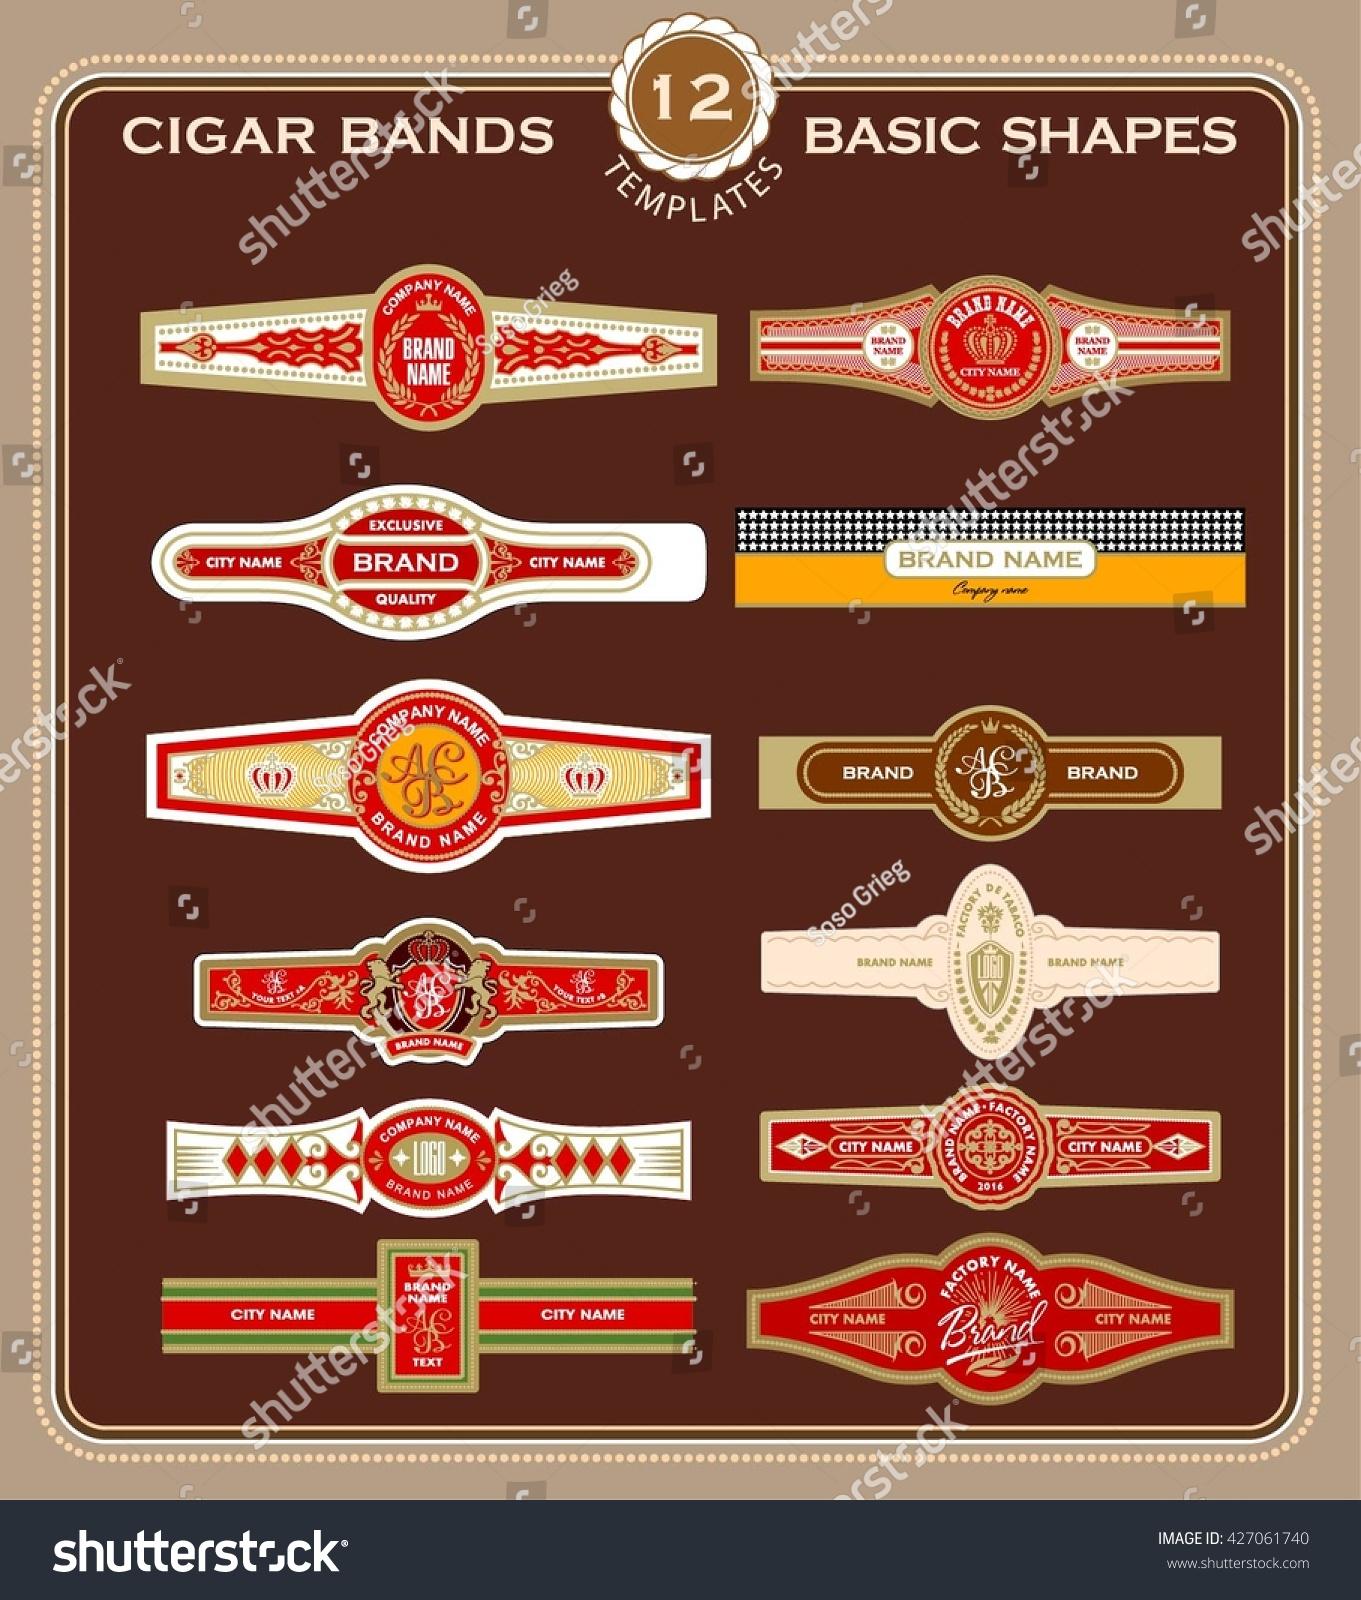 Set Cigar Band Design Templates Stock Vector Royalty Free